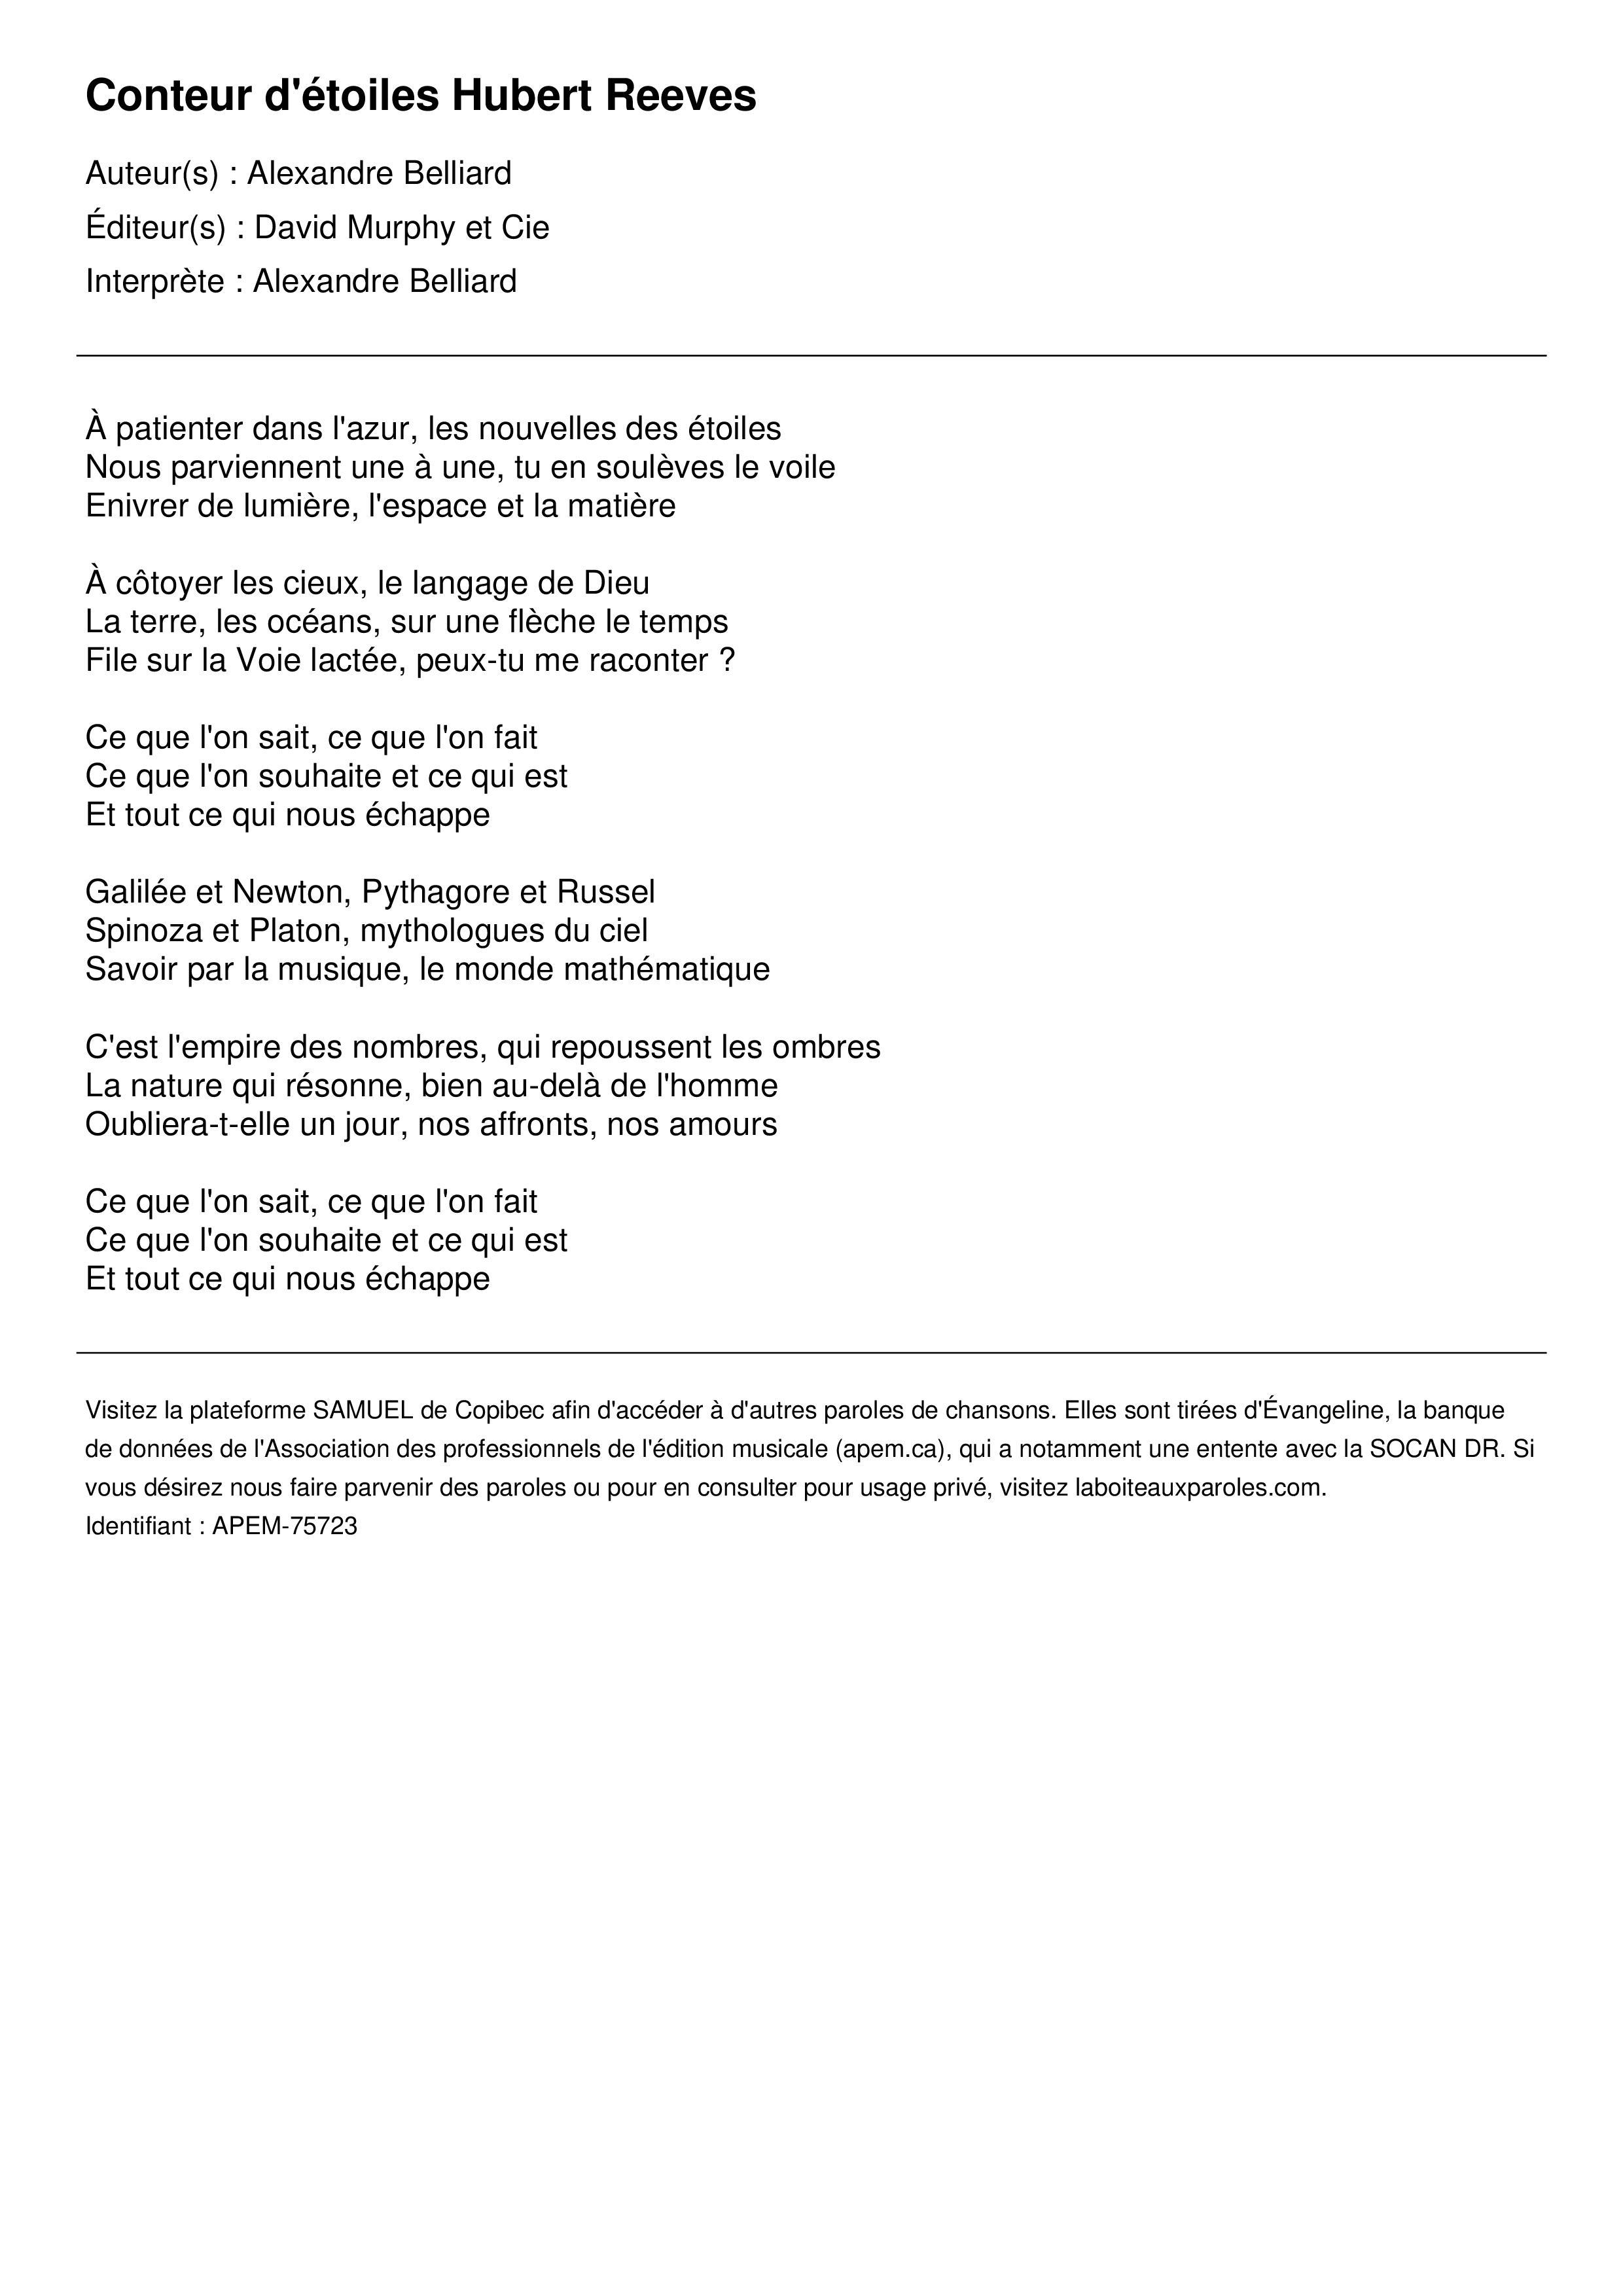 Conteur d'étoiles Hubert Reeves